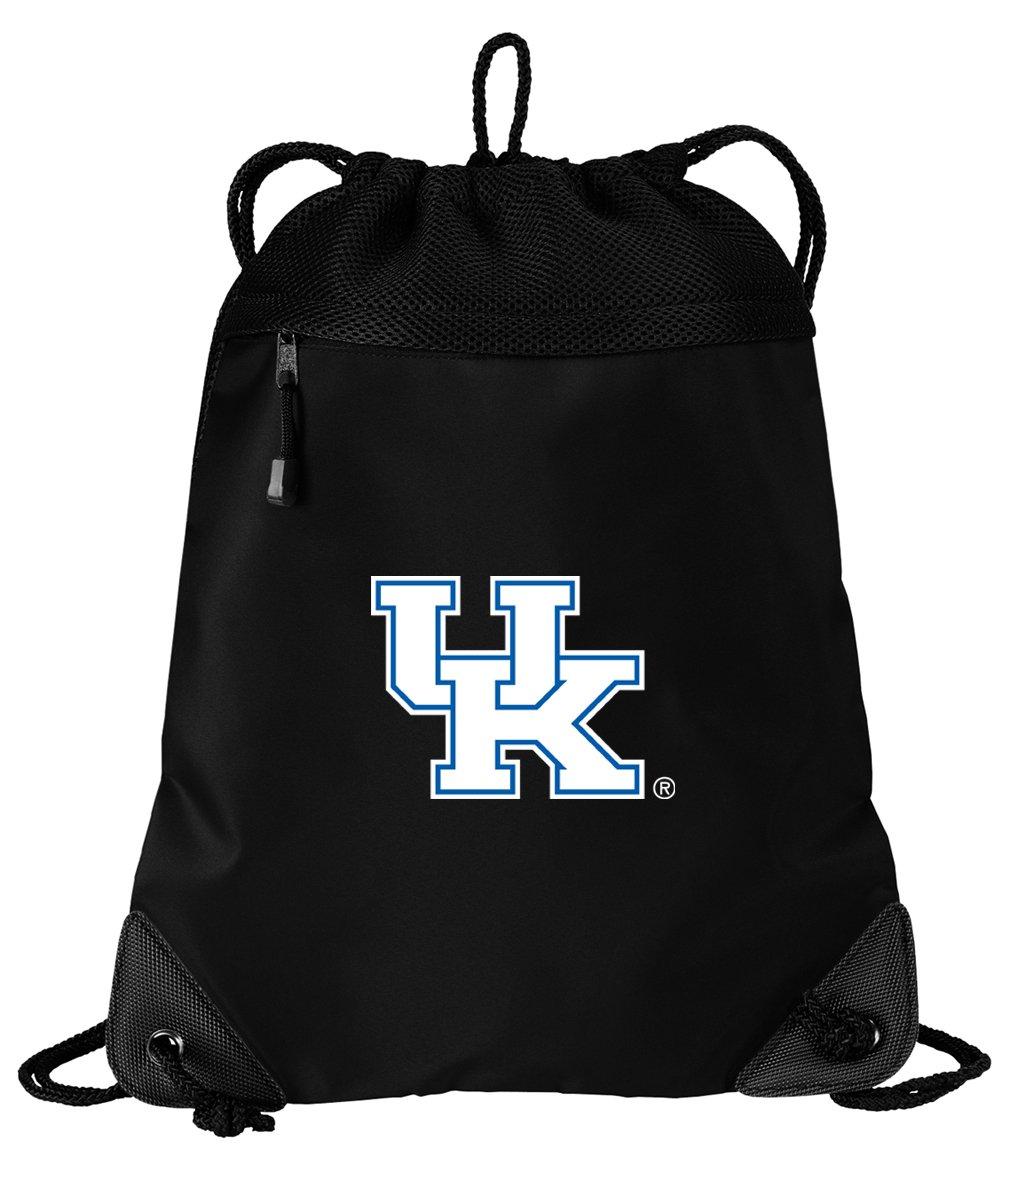 Broad Bay Kentucky Wildcats Drawstring Bag University of Kentucky Cinch Pack Backpack UNIQUE MESH & MICROFIBER